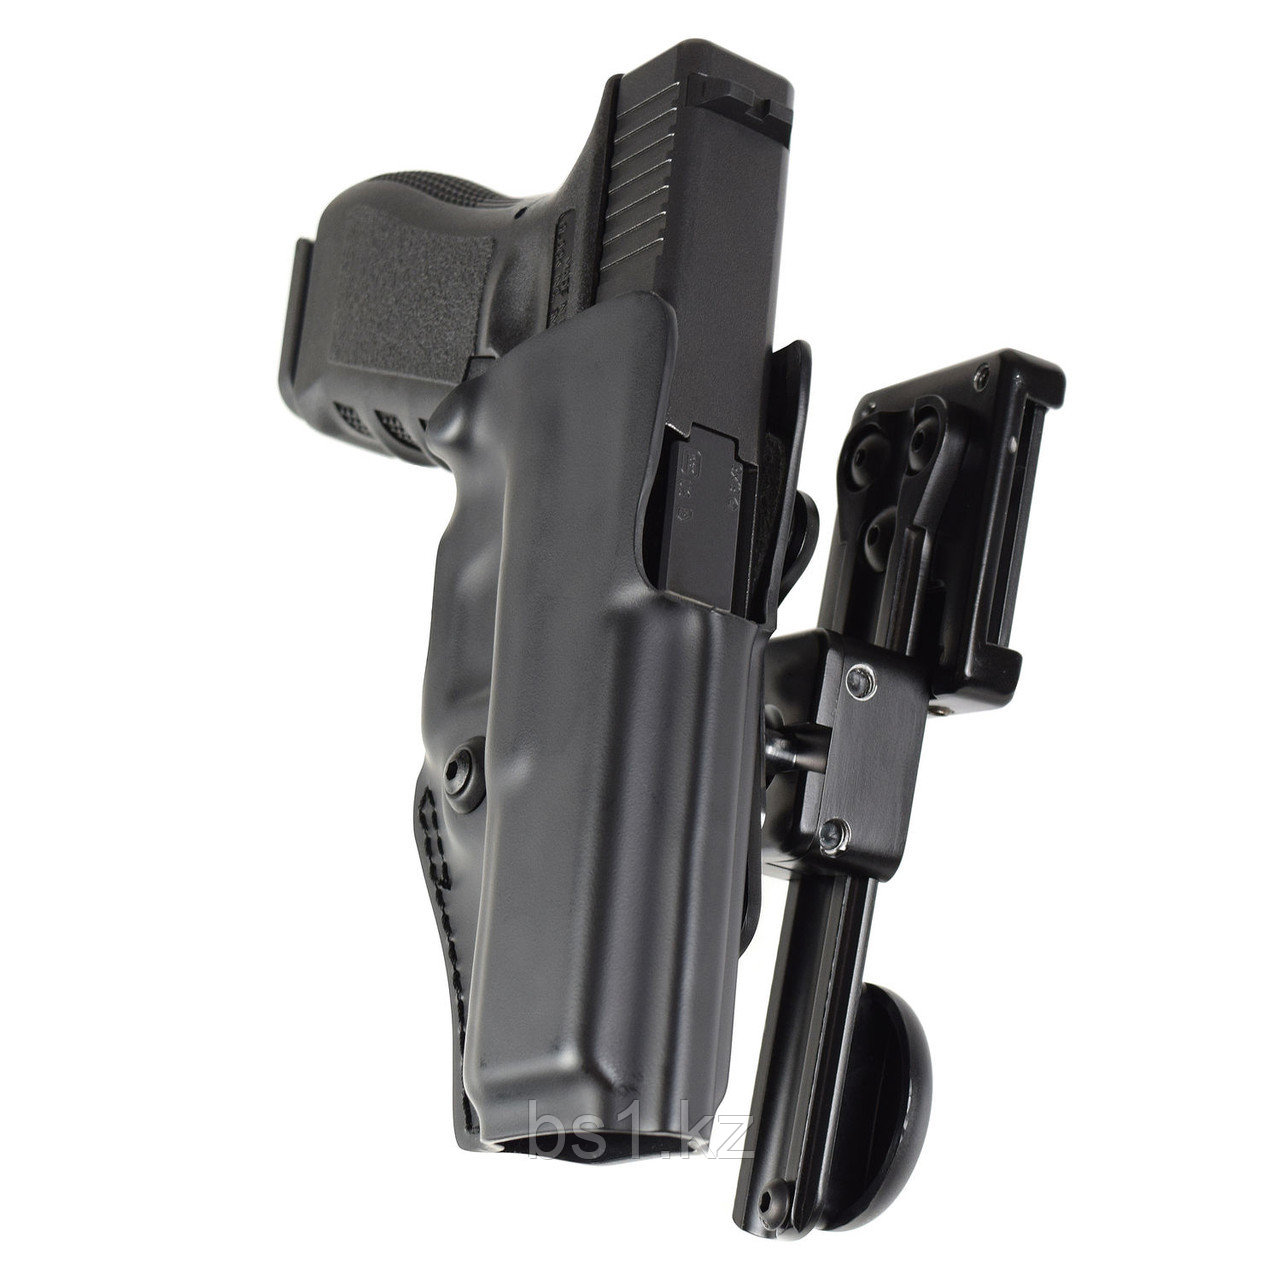 Тактическая кобура Model 5197 Open Top Competition Holster with USPSA Kit